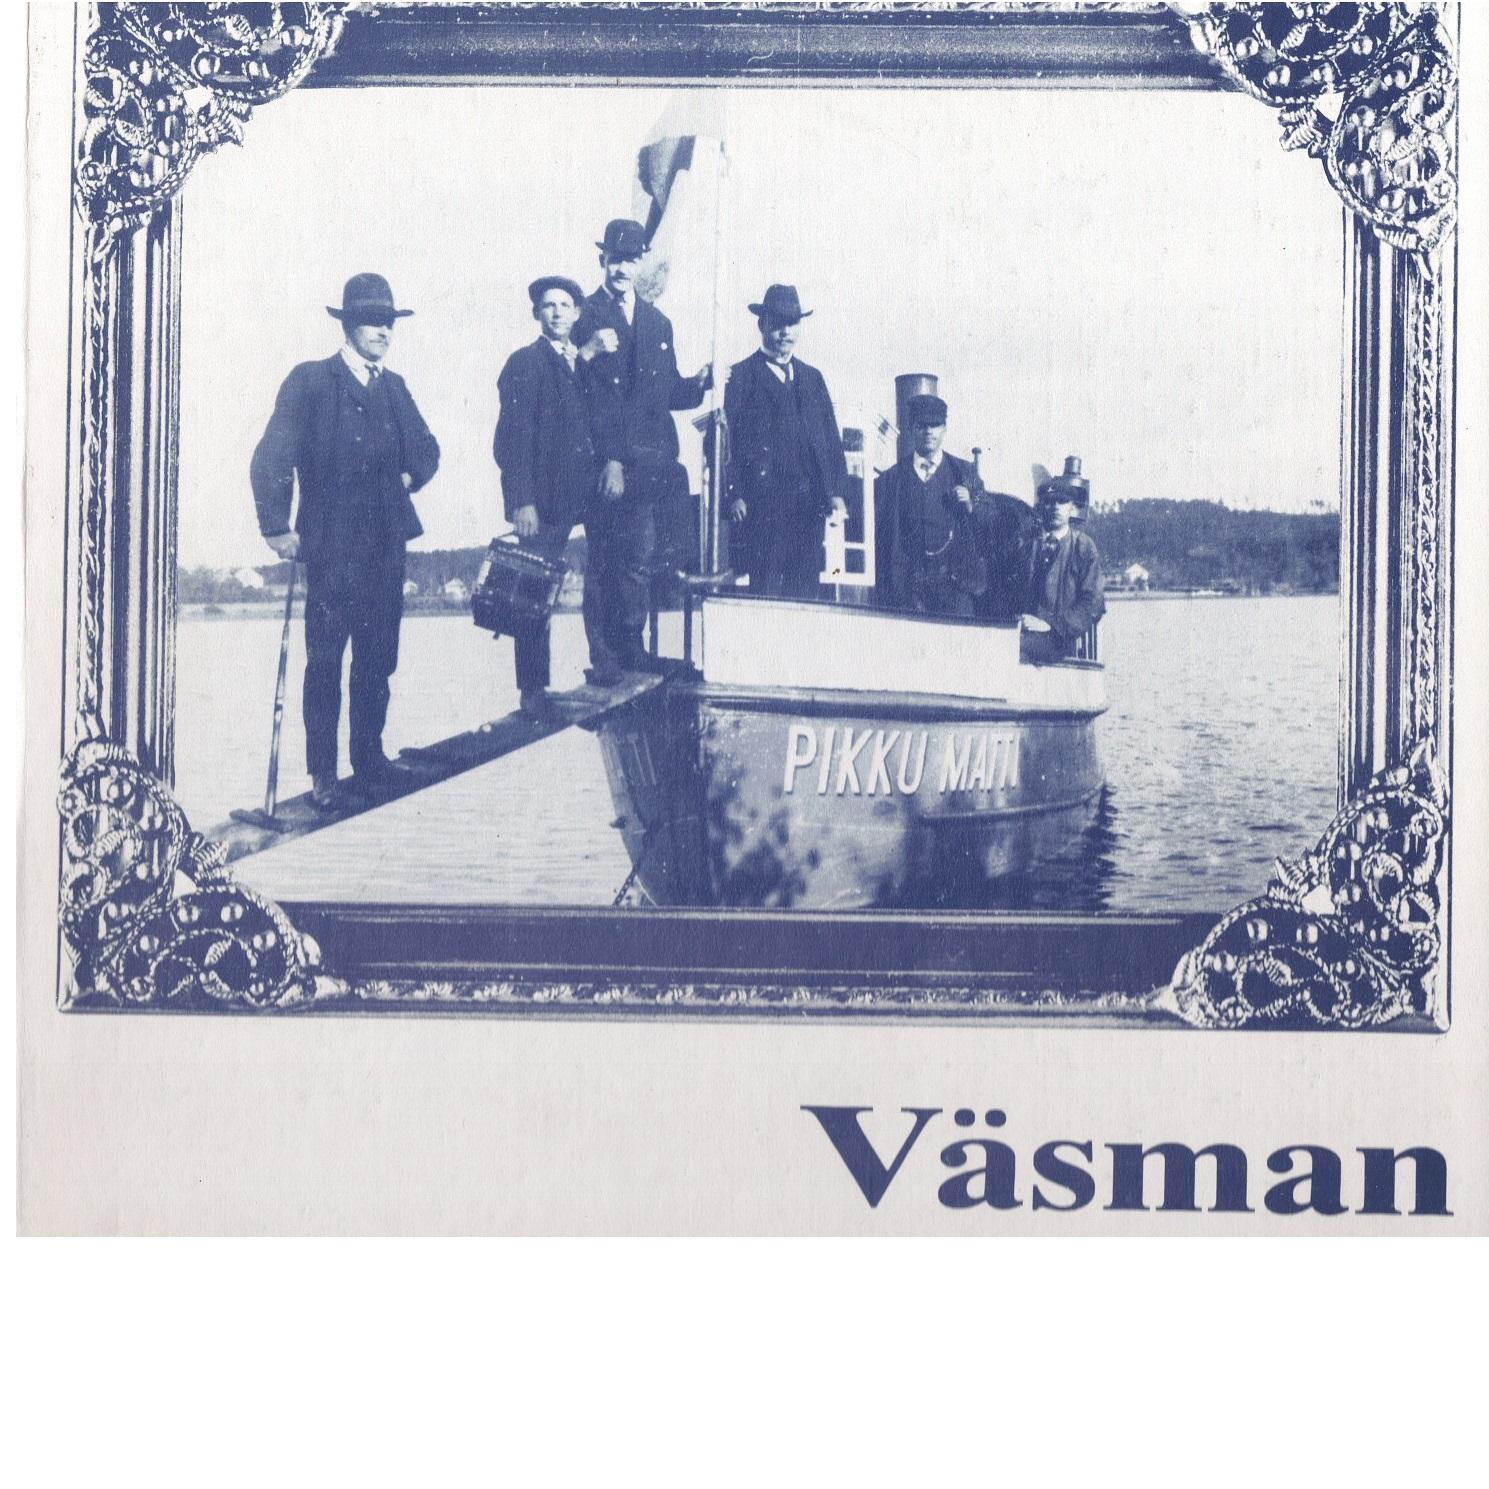 Väsman - Håkansson, Nils Göte